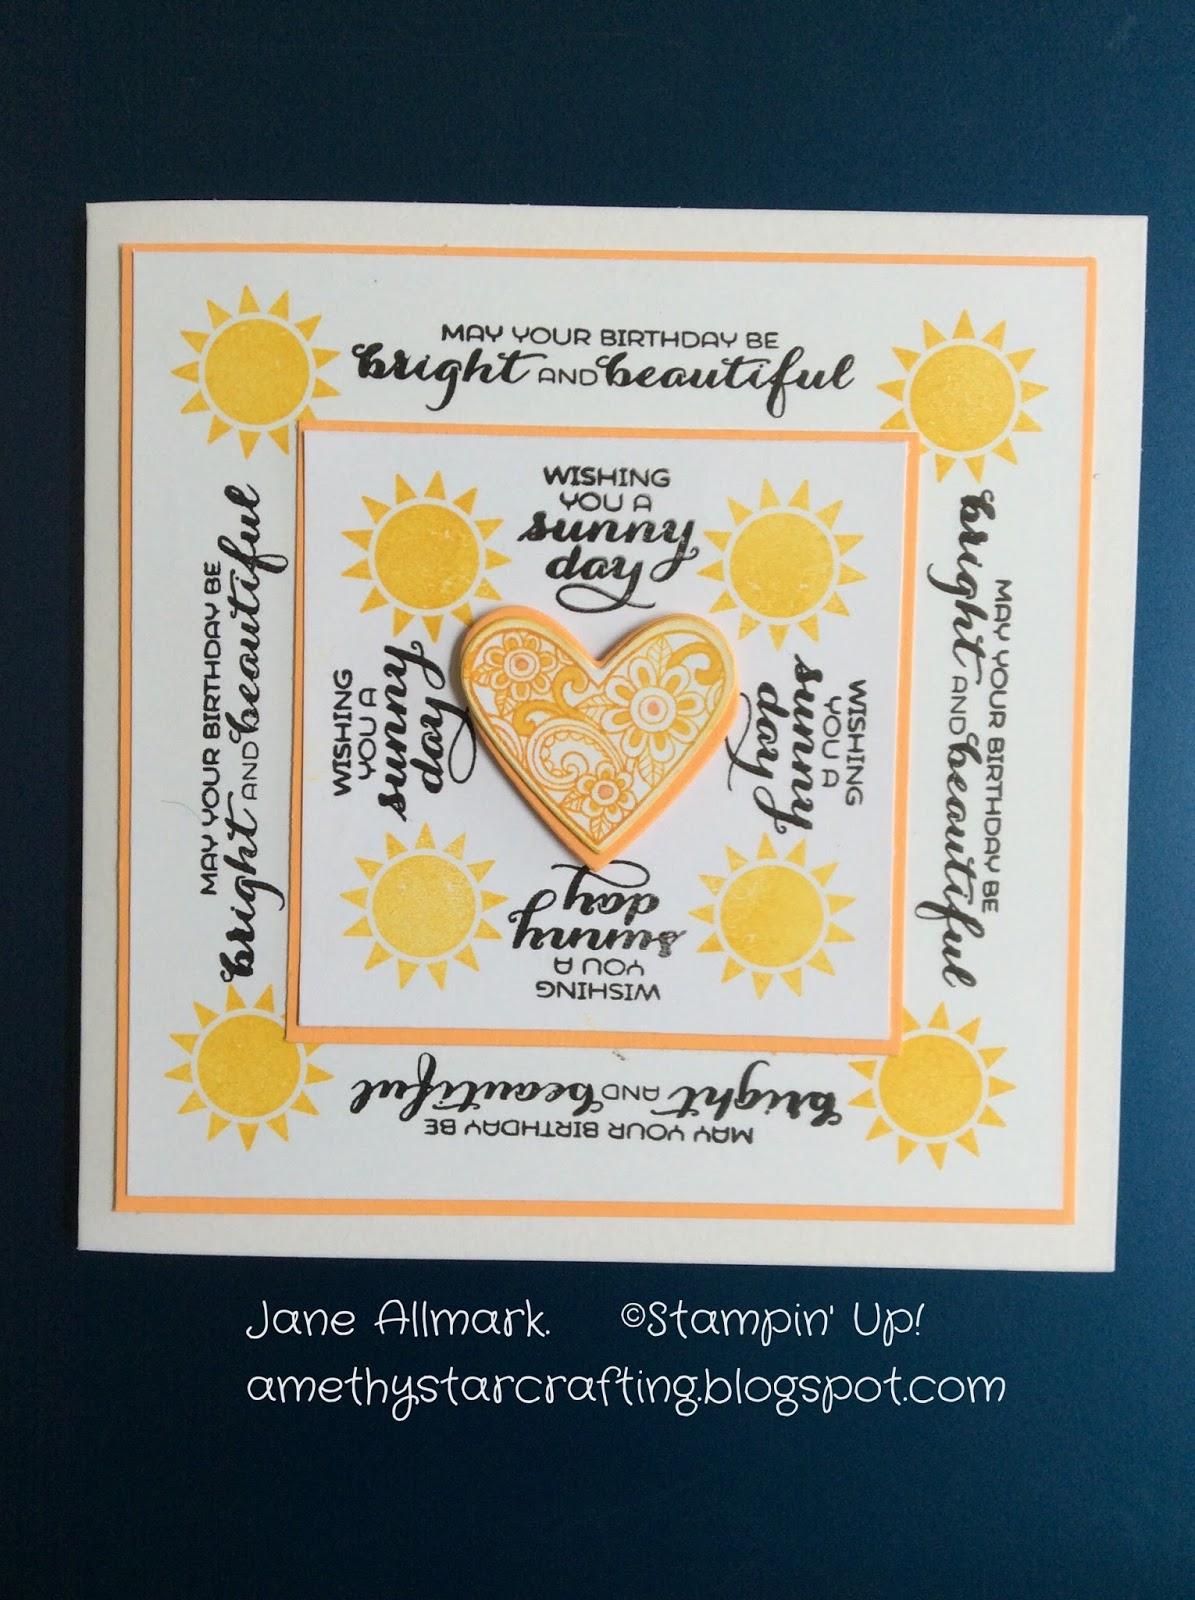 Amethystar Crafting Stampin Up Stamparatus Template Stamping